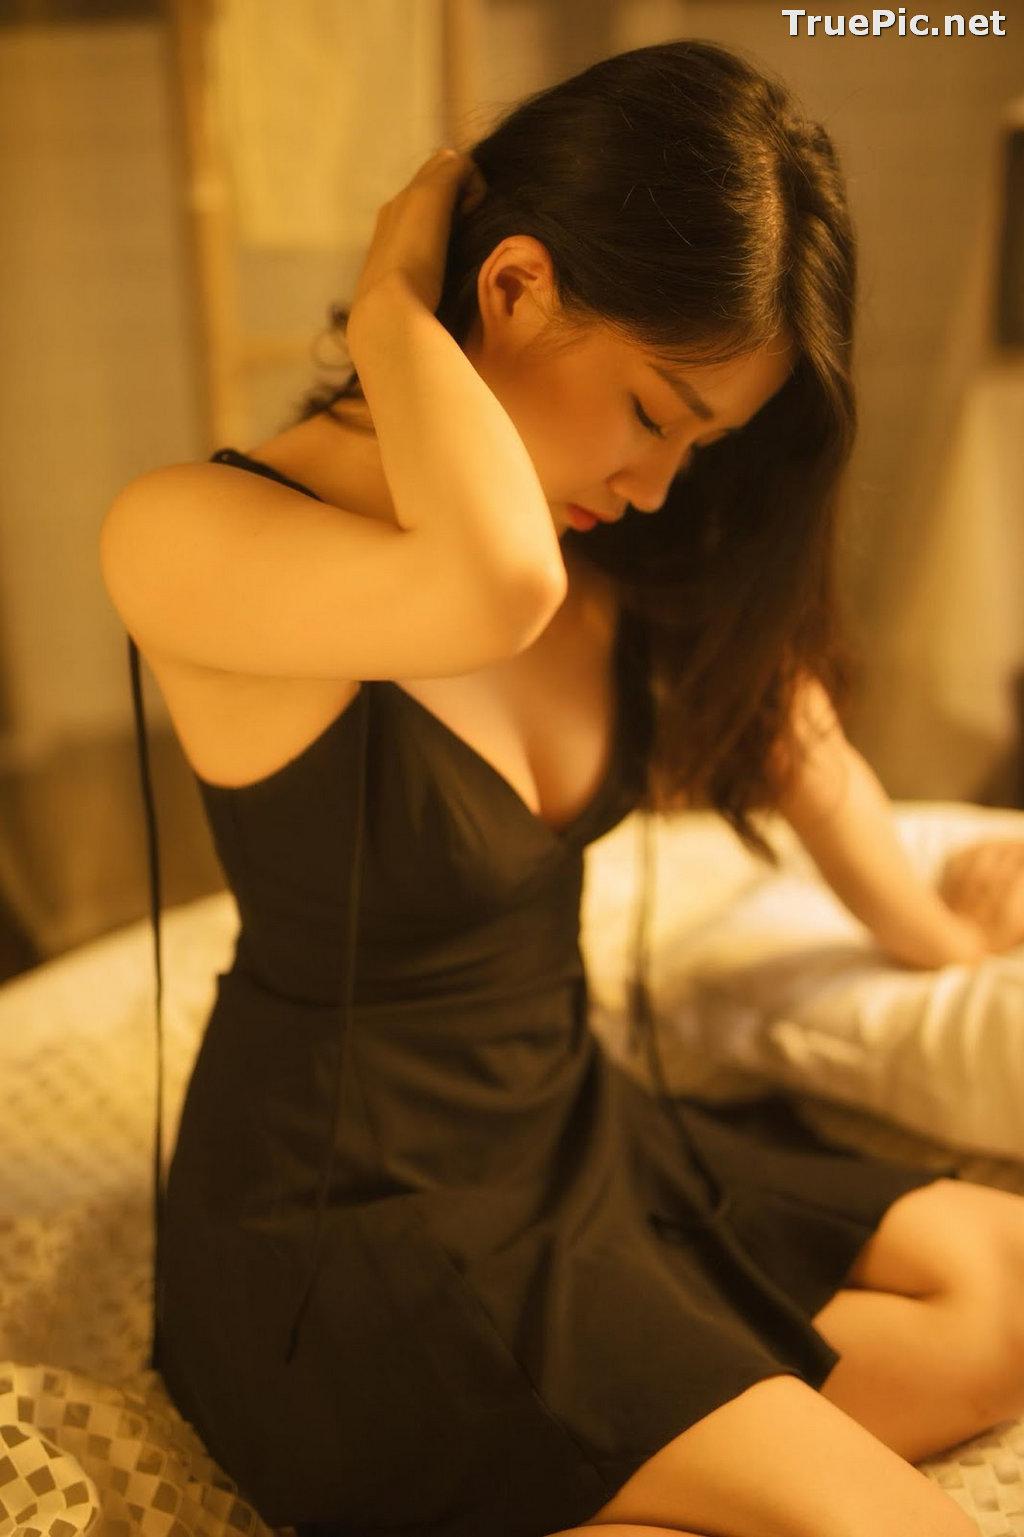 Image Vietnamese Hot Girl - Nguyen Hoang Kieu Trinh - My Black Angel - TruePic.net - Picture-25